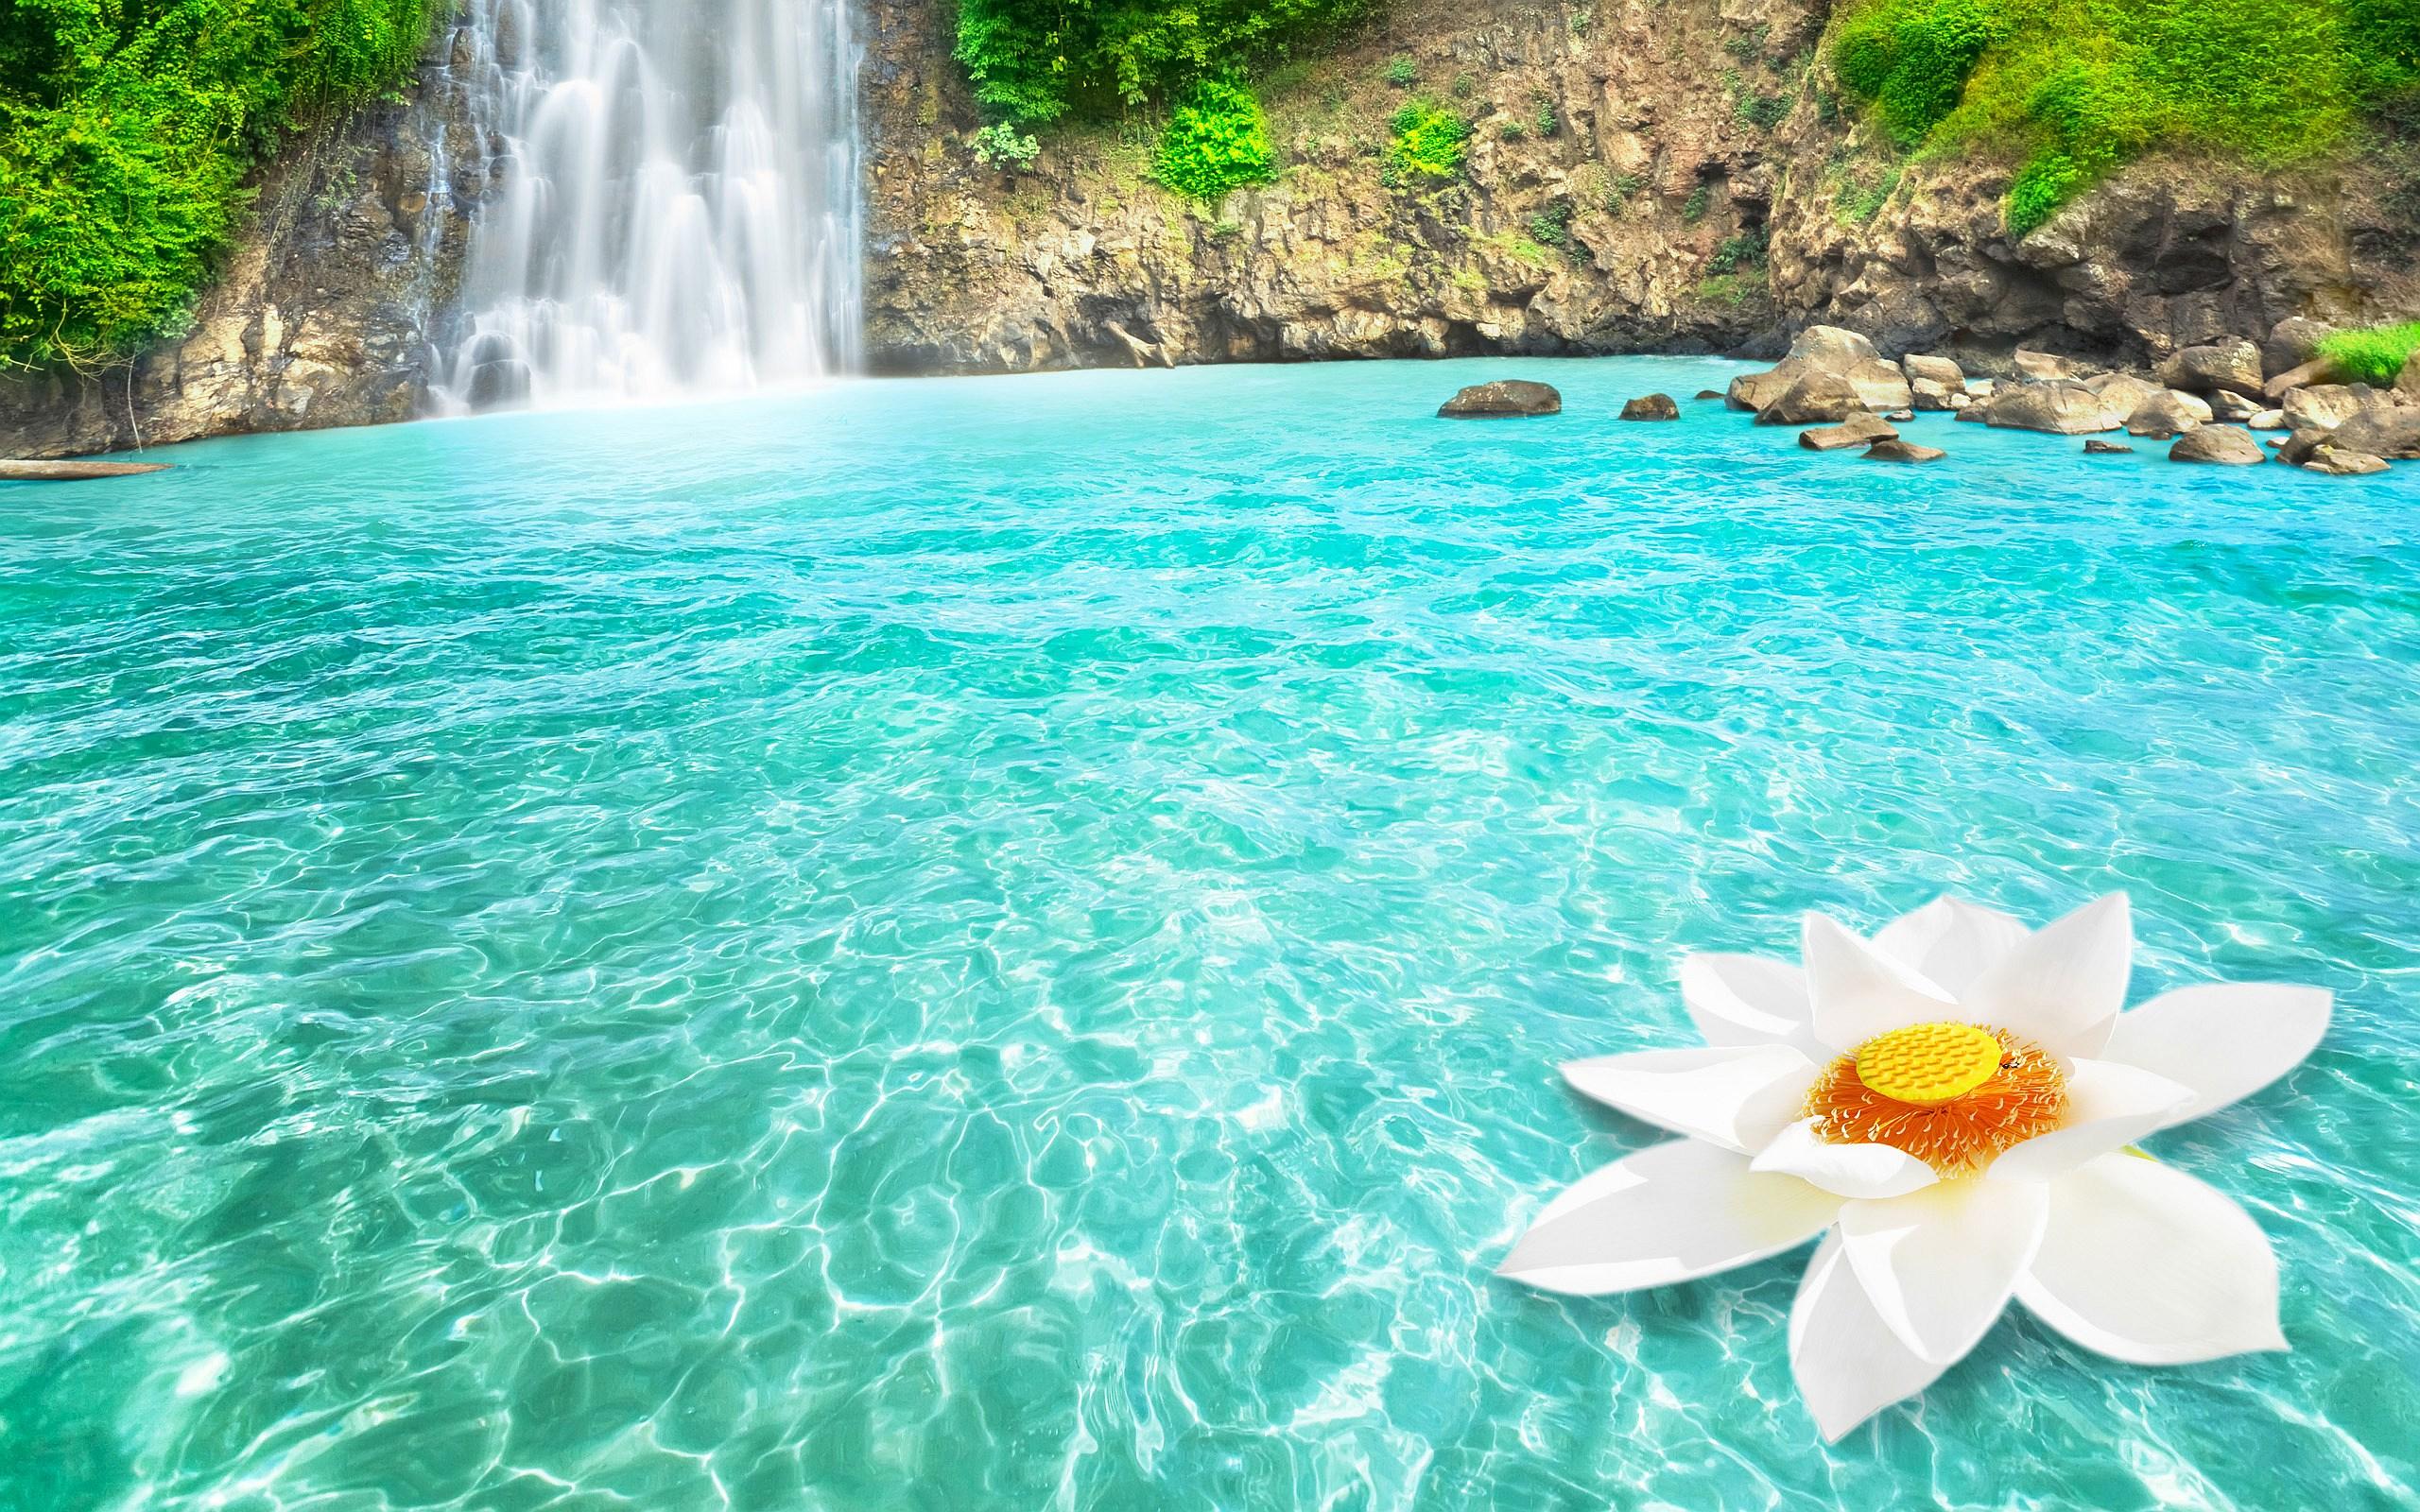 Beautiful Waterfall 2560x1600 Download Hd Wallpaper Wallpapertip